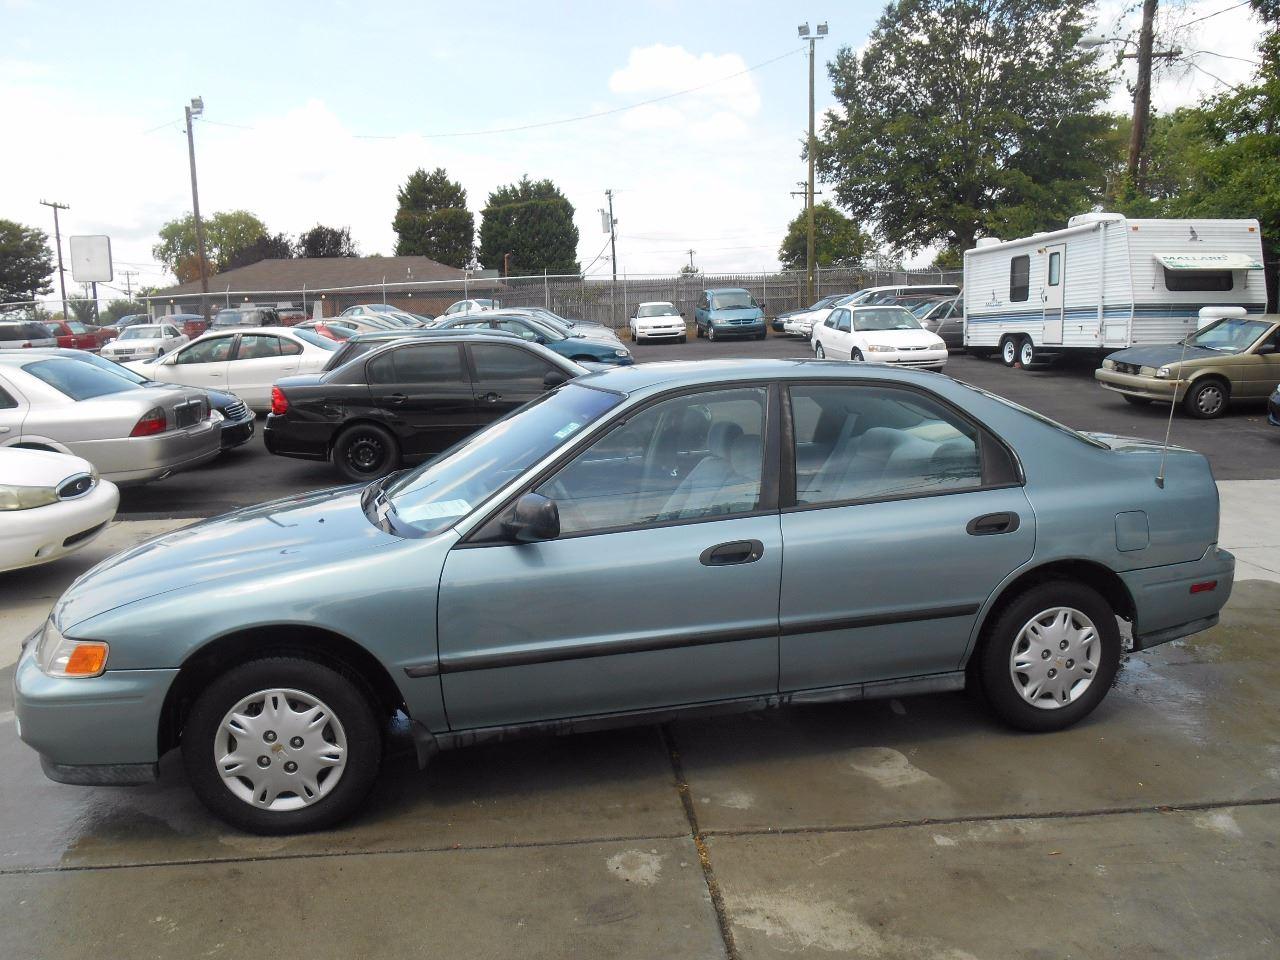 1995 honda accord dx 4dr sedan in charlotte nc mike s auto sales of charlotte 1995 honda accord dx 4dr sedan in